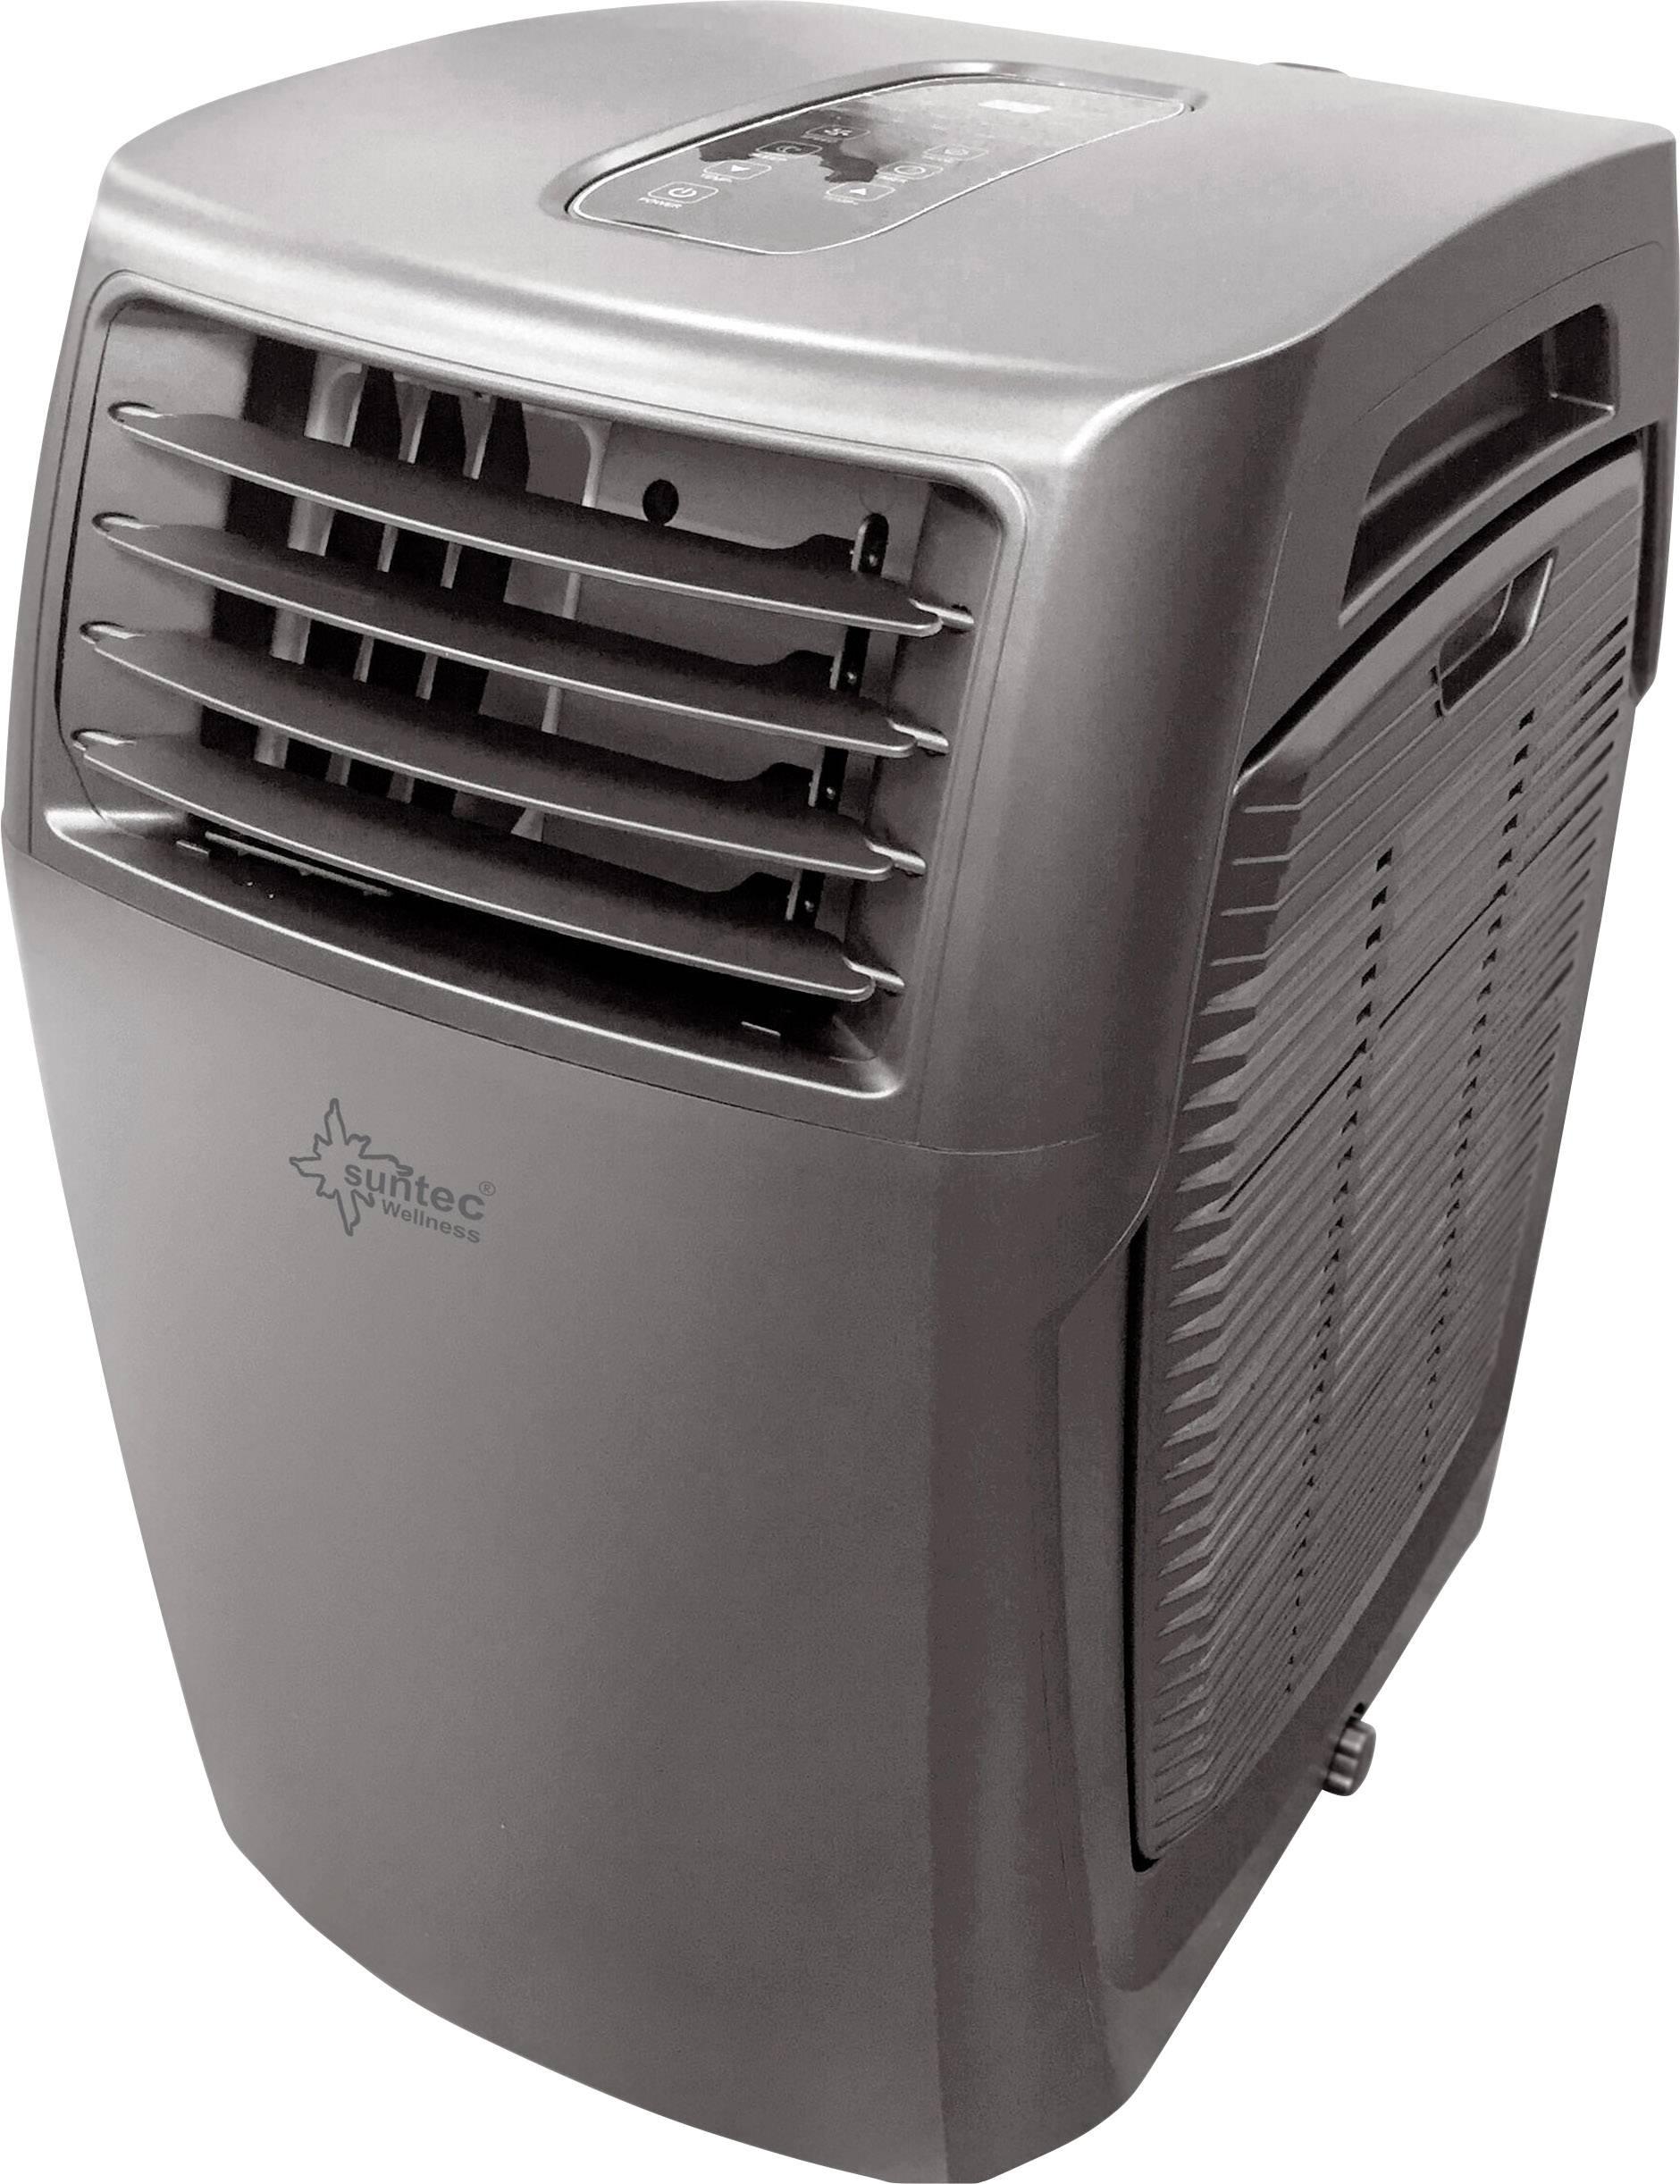 Klimagerat Monoblock Trotec Lokales Klimagerat Pac 3500 E